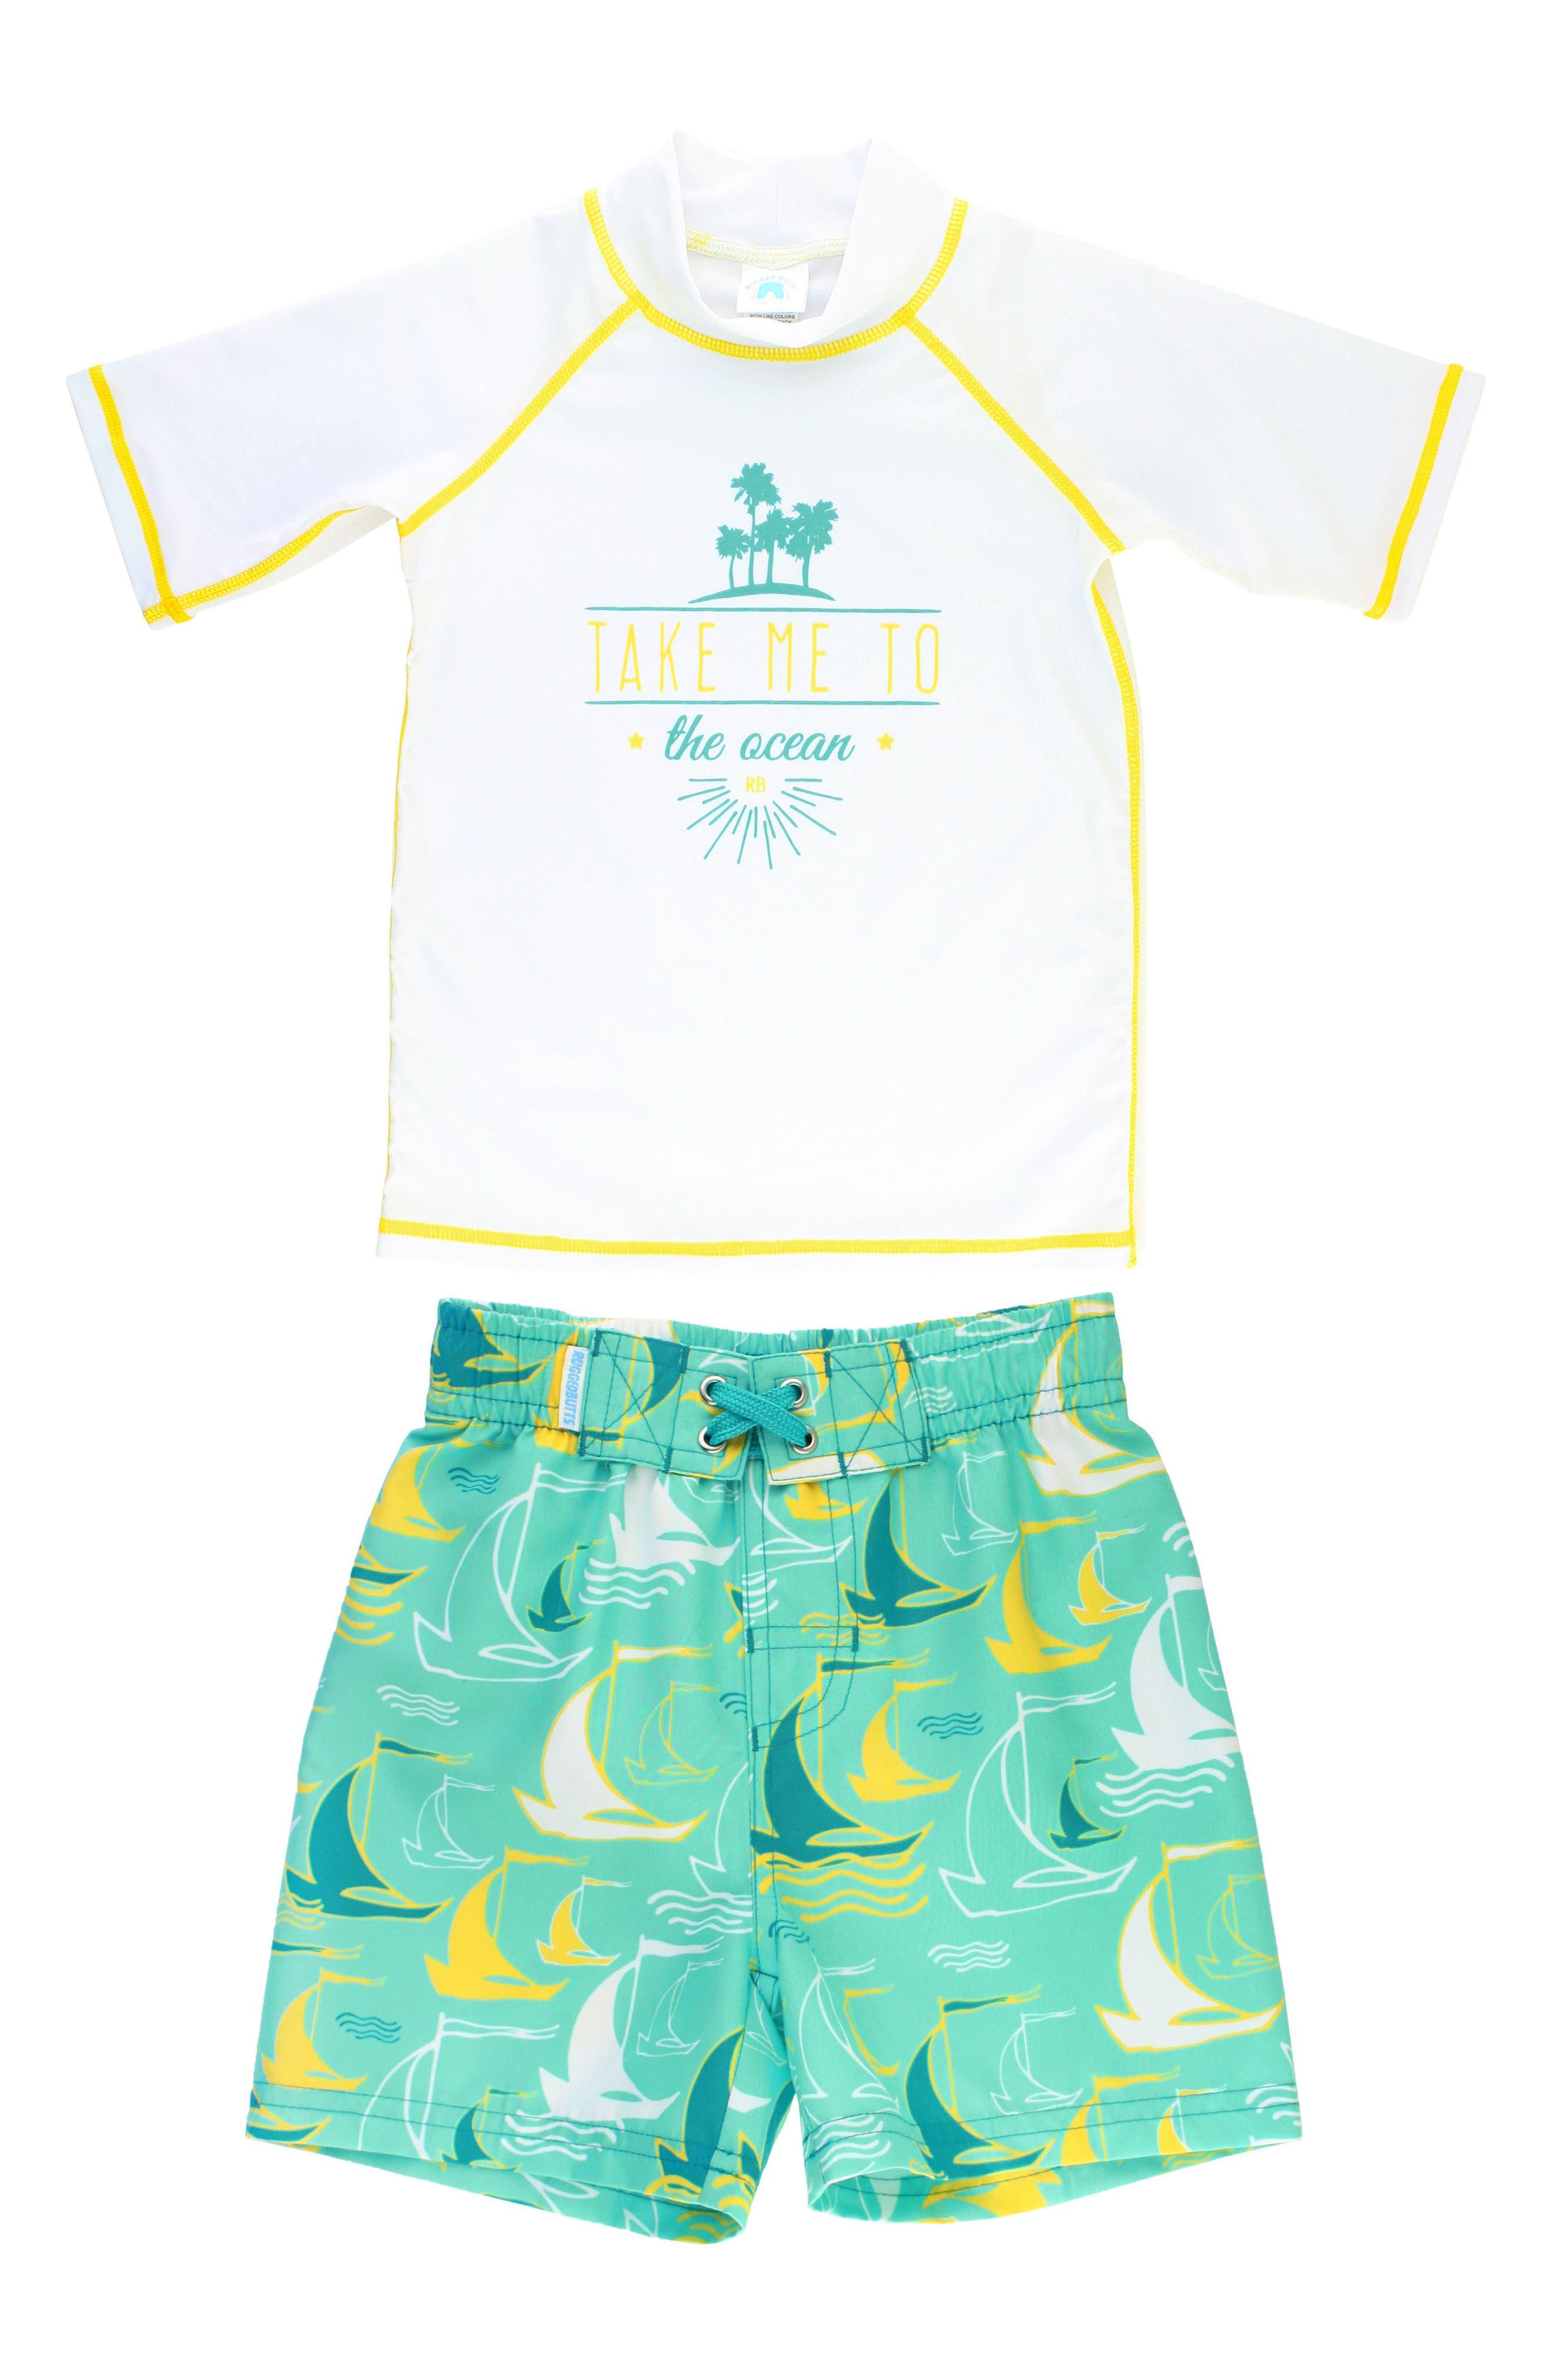 Main Image - RuggedButts Two-Piece Rashguard Swimsuit (Baby Boys)